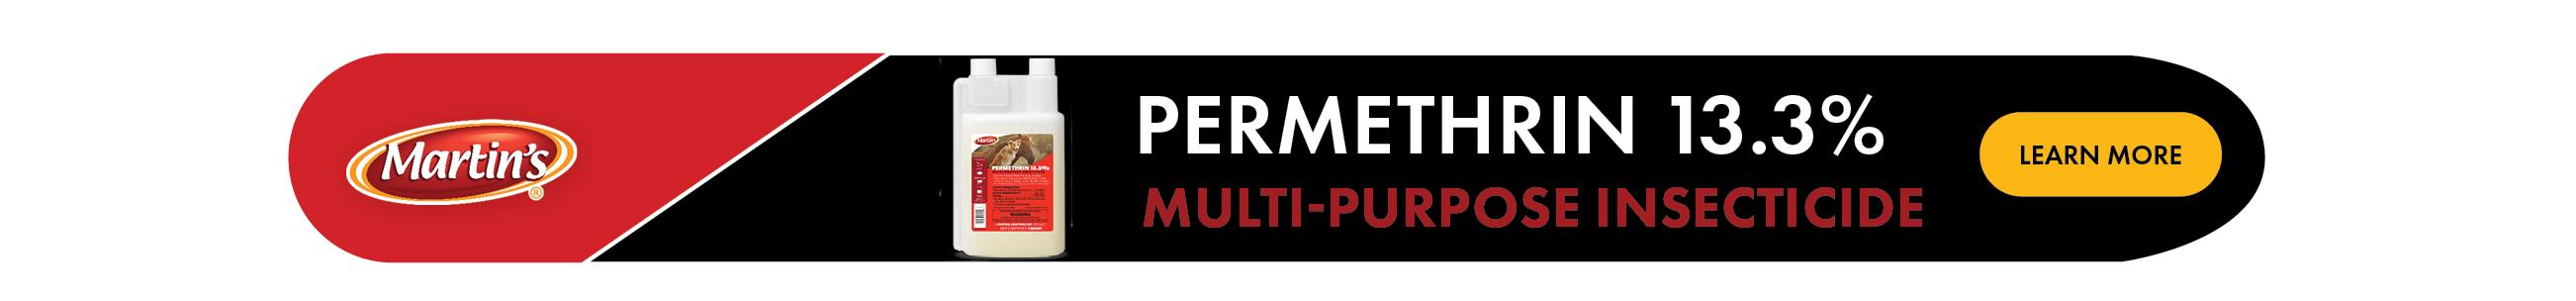 Permethrin 13.3